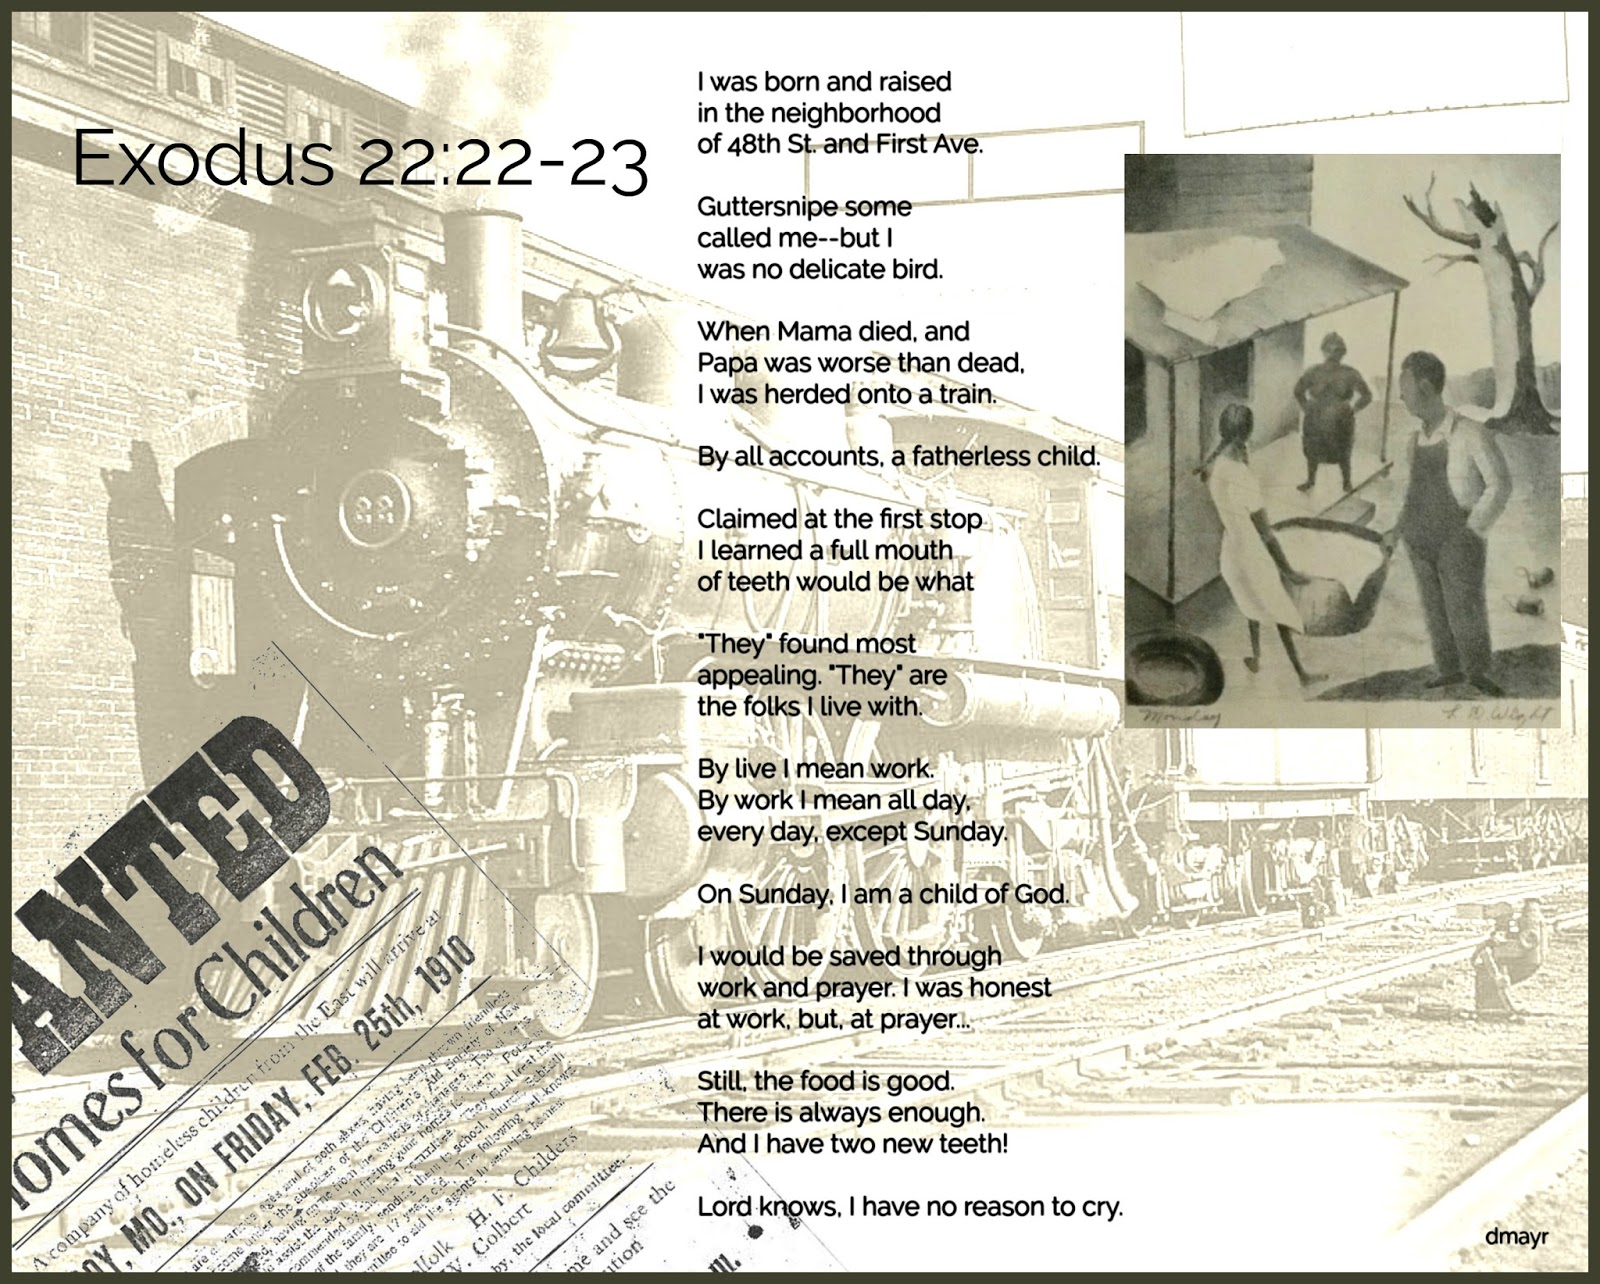 February 23 - scenario of the celebration in verse